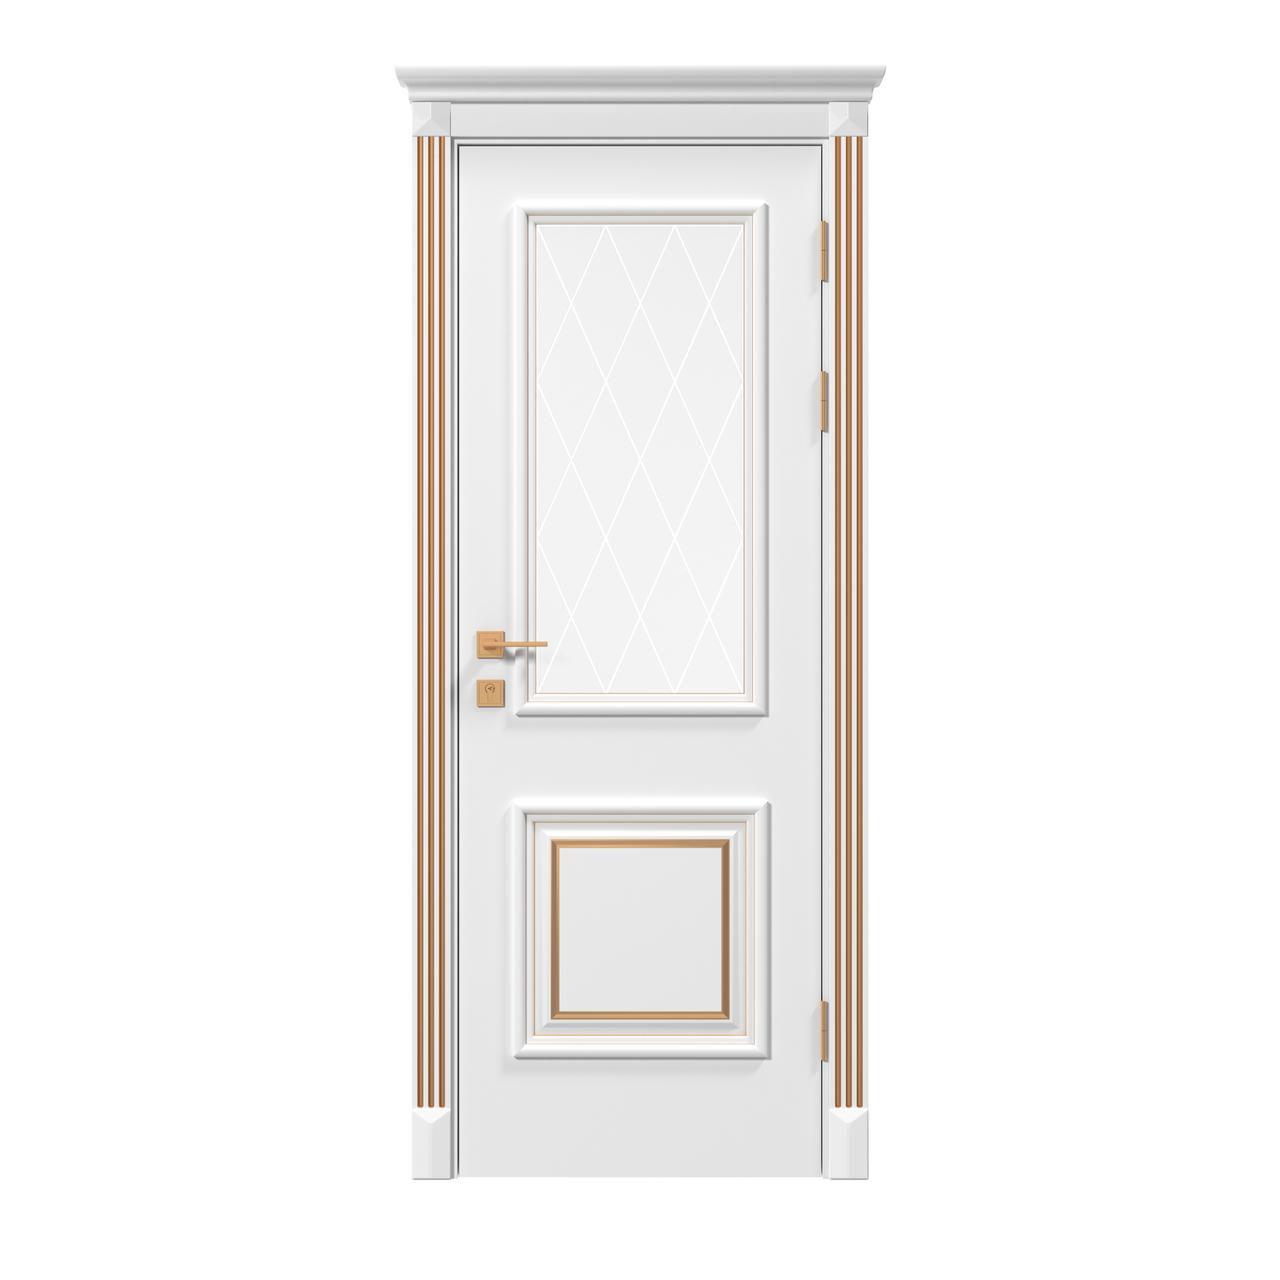 Двери Родос Siena Laura стекло, RAL, патина